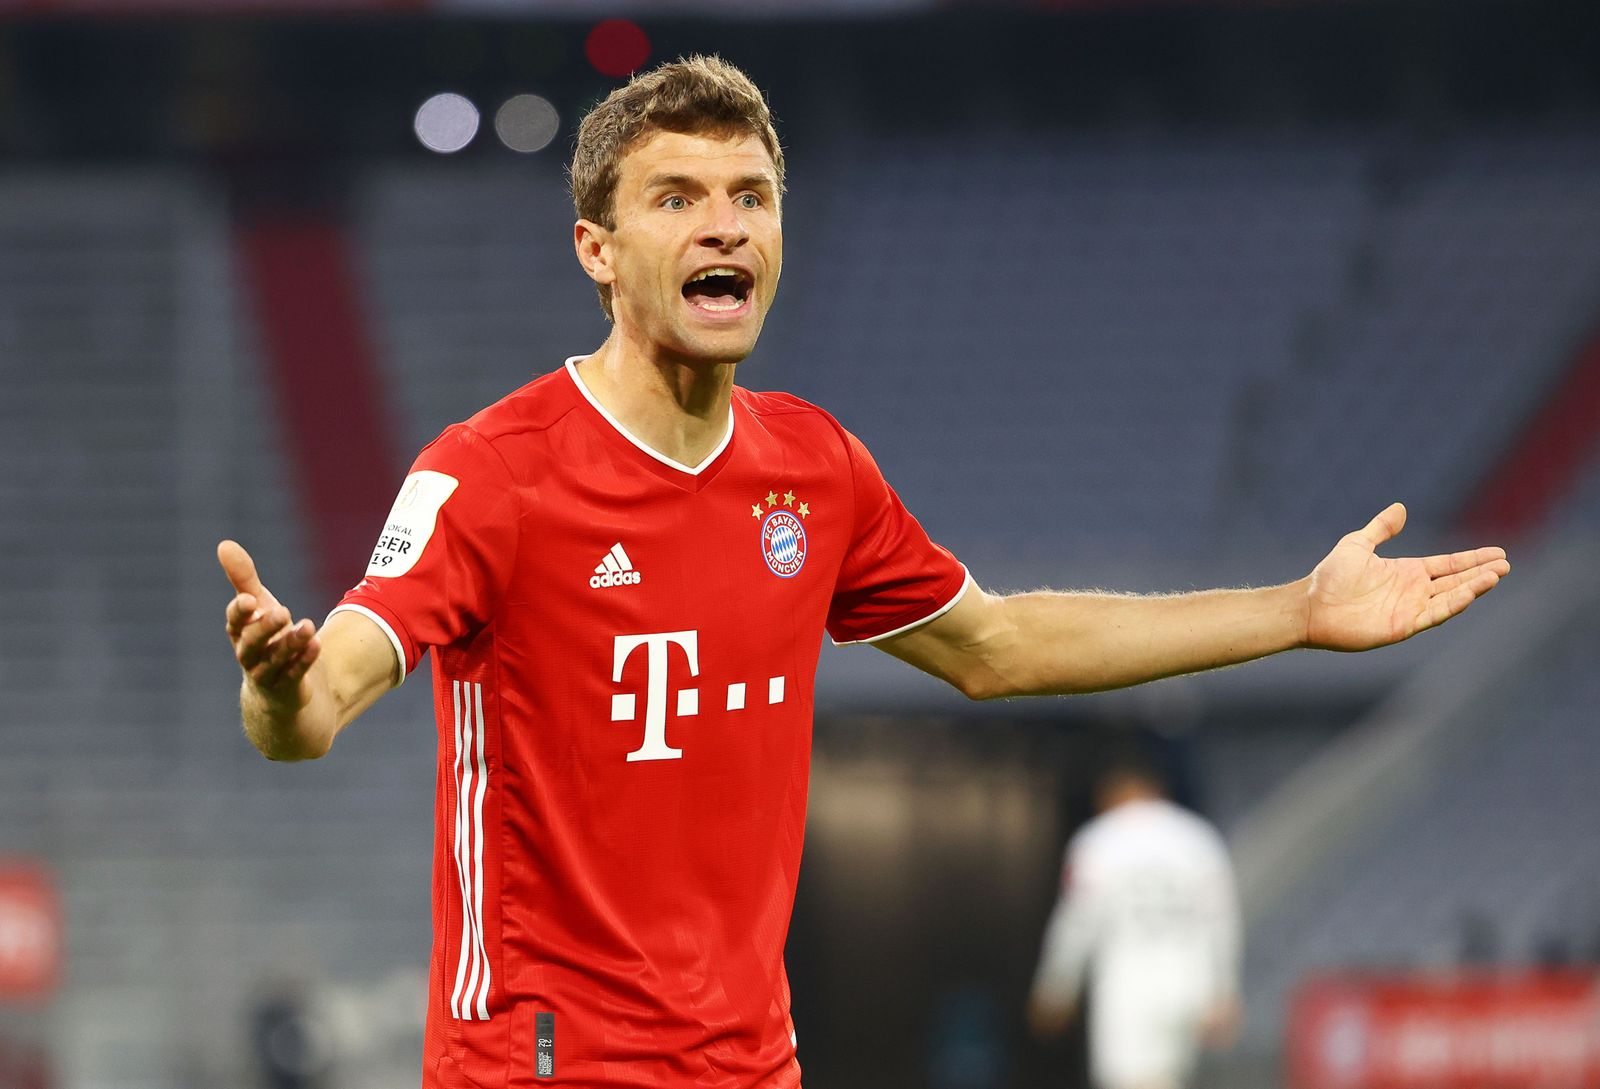 Bayern Munich vs Eintracht Frankfurt, Germany - 10 Jun 2020